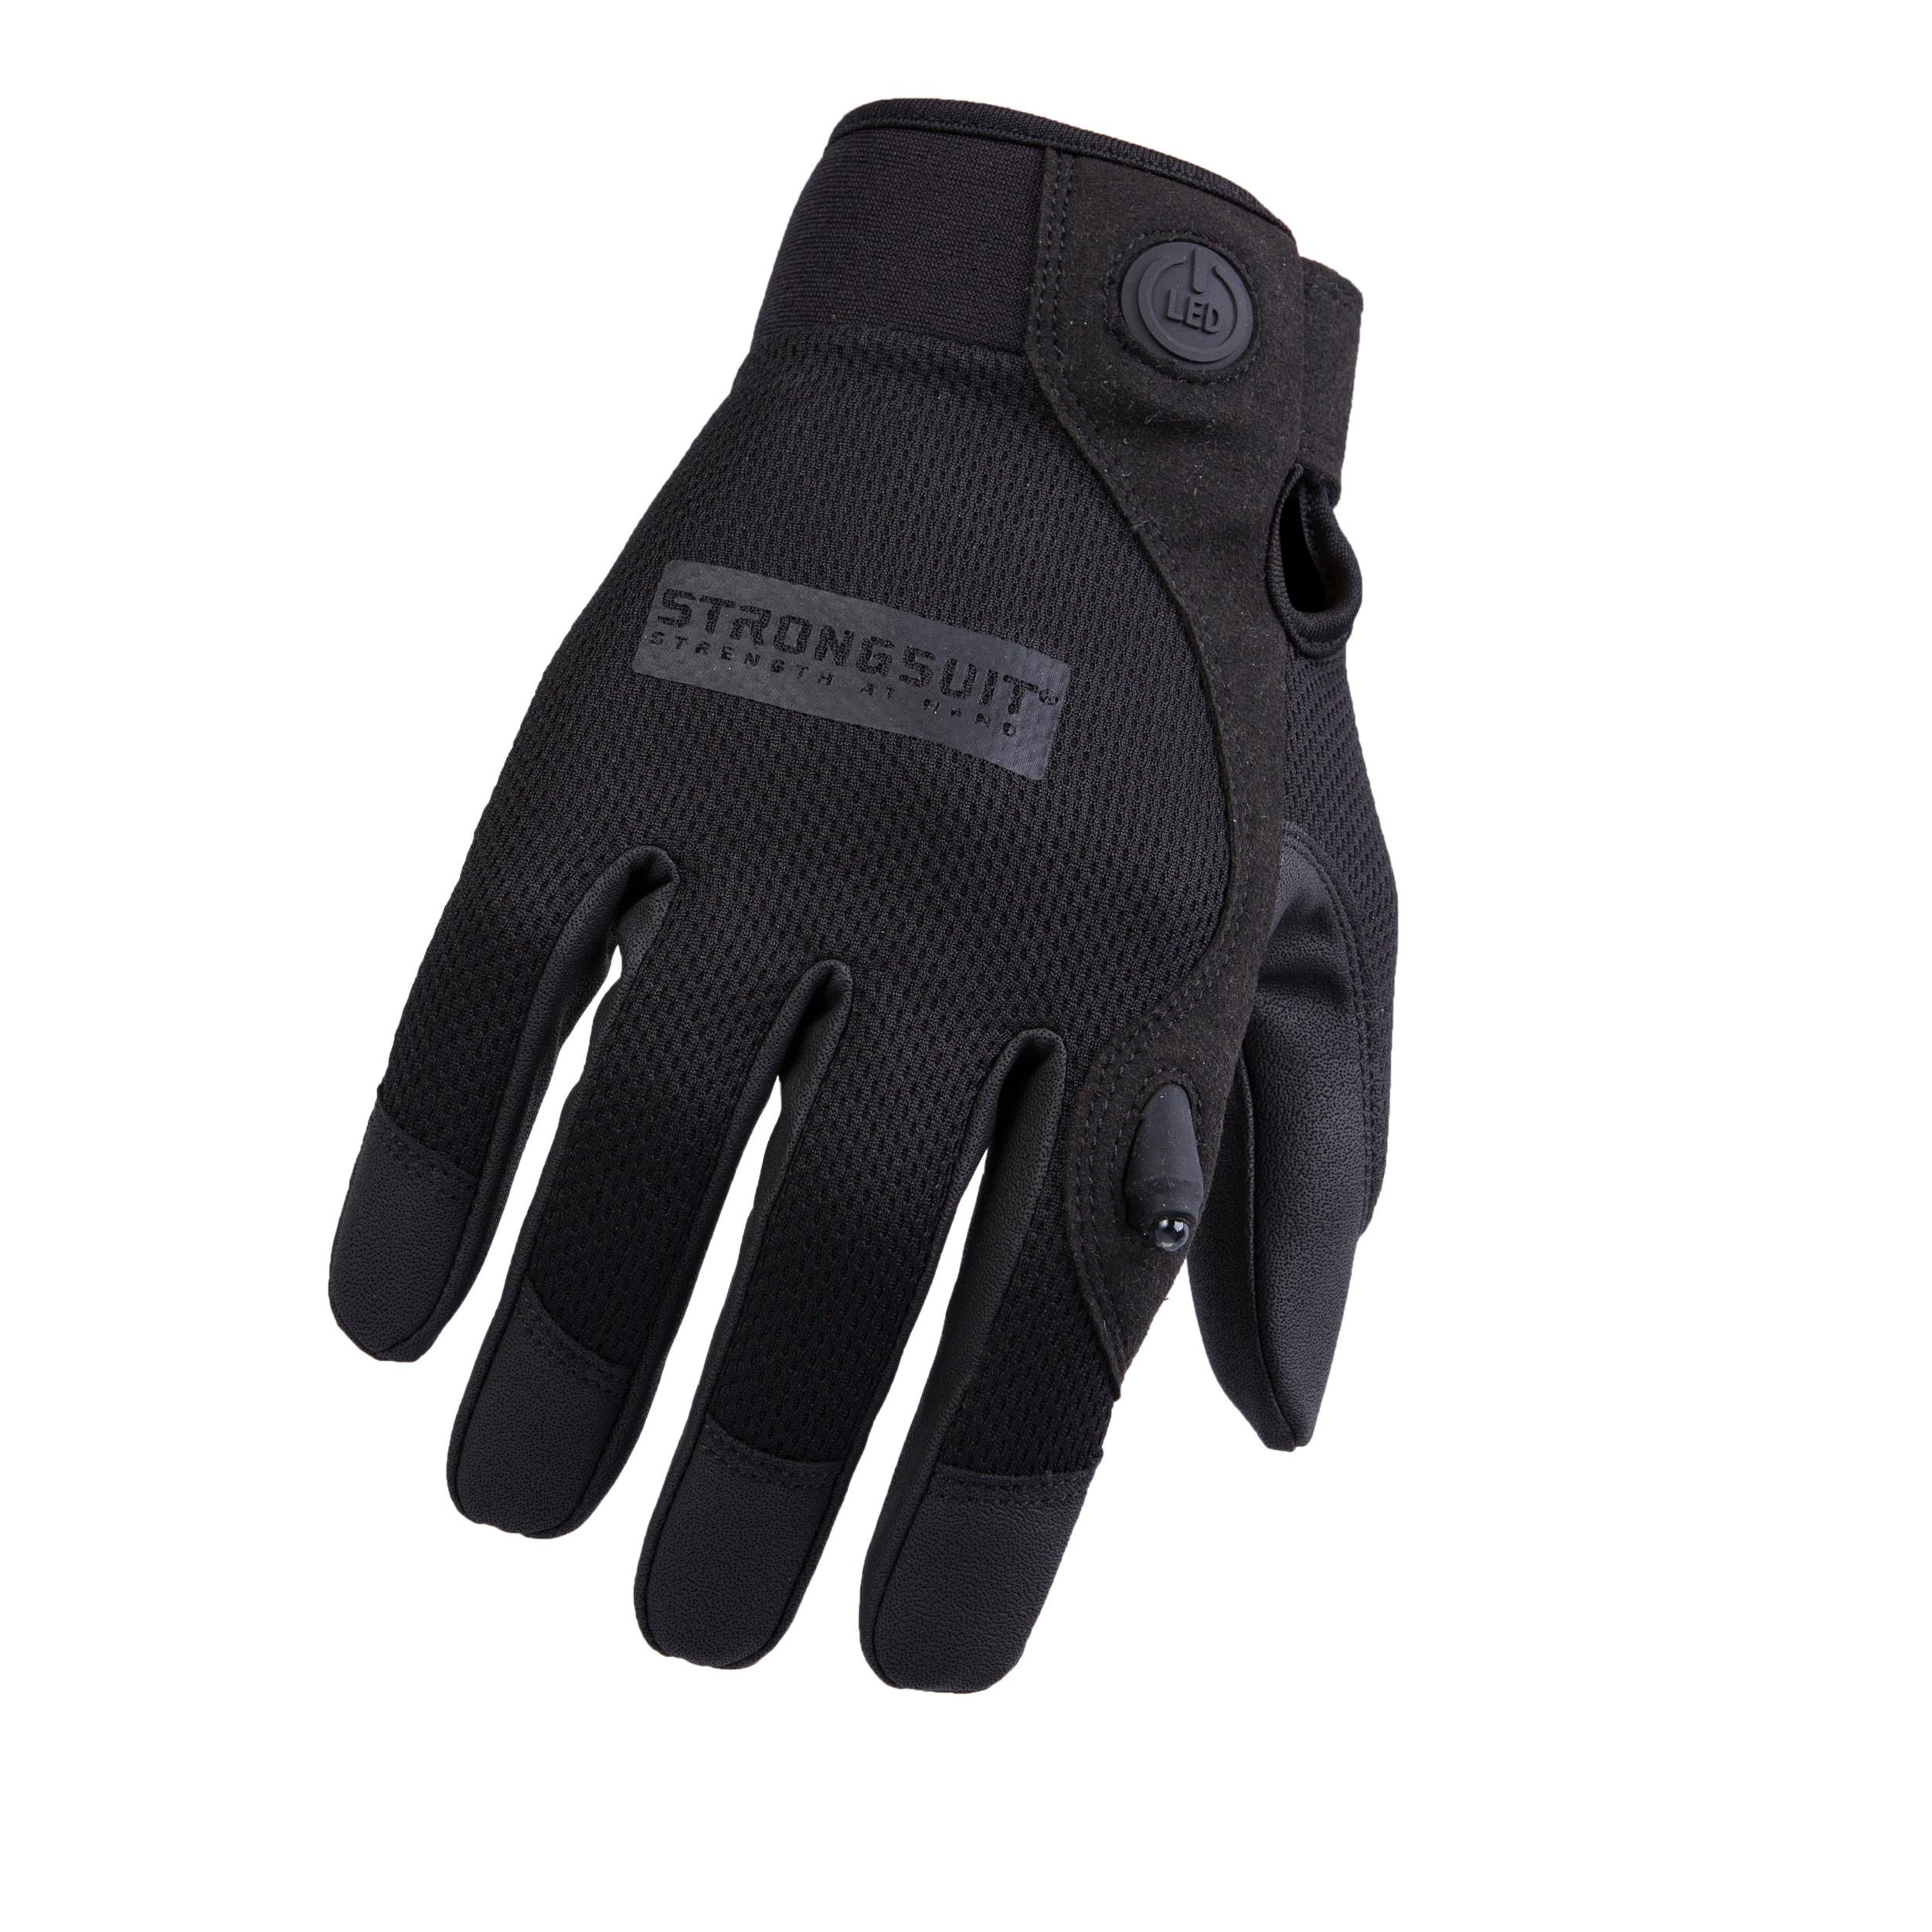 Second Skin, LED Gloves, Black, Medium